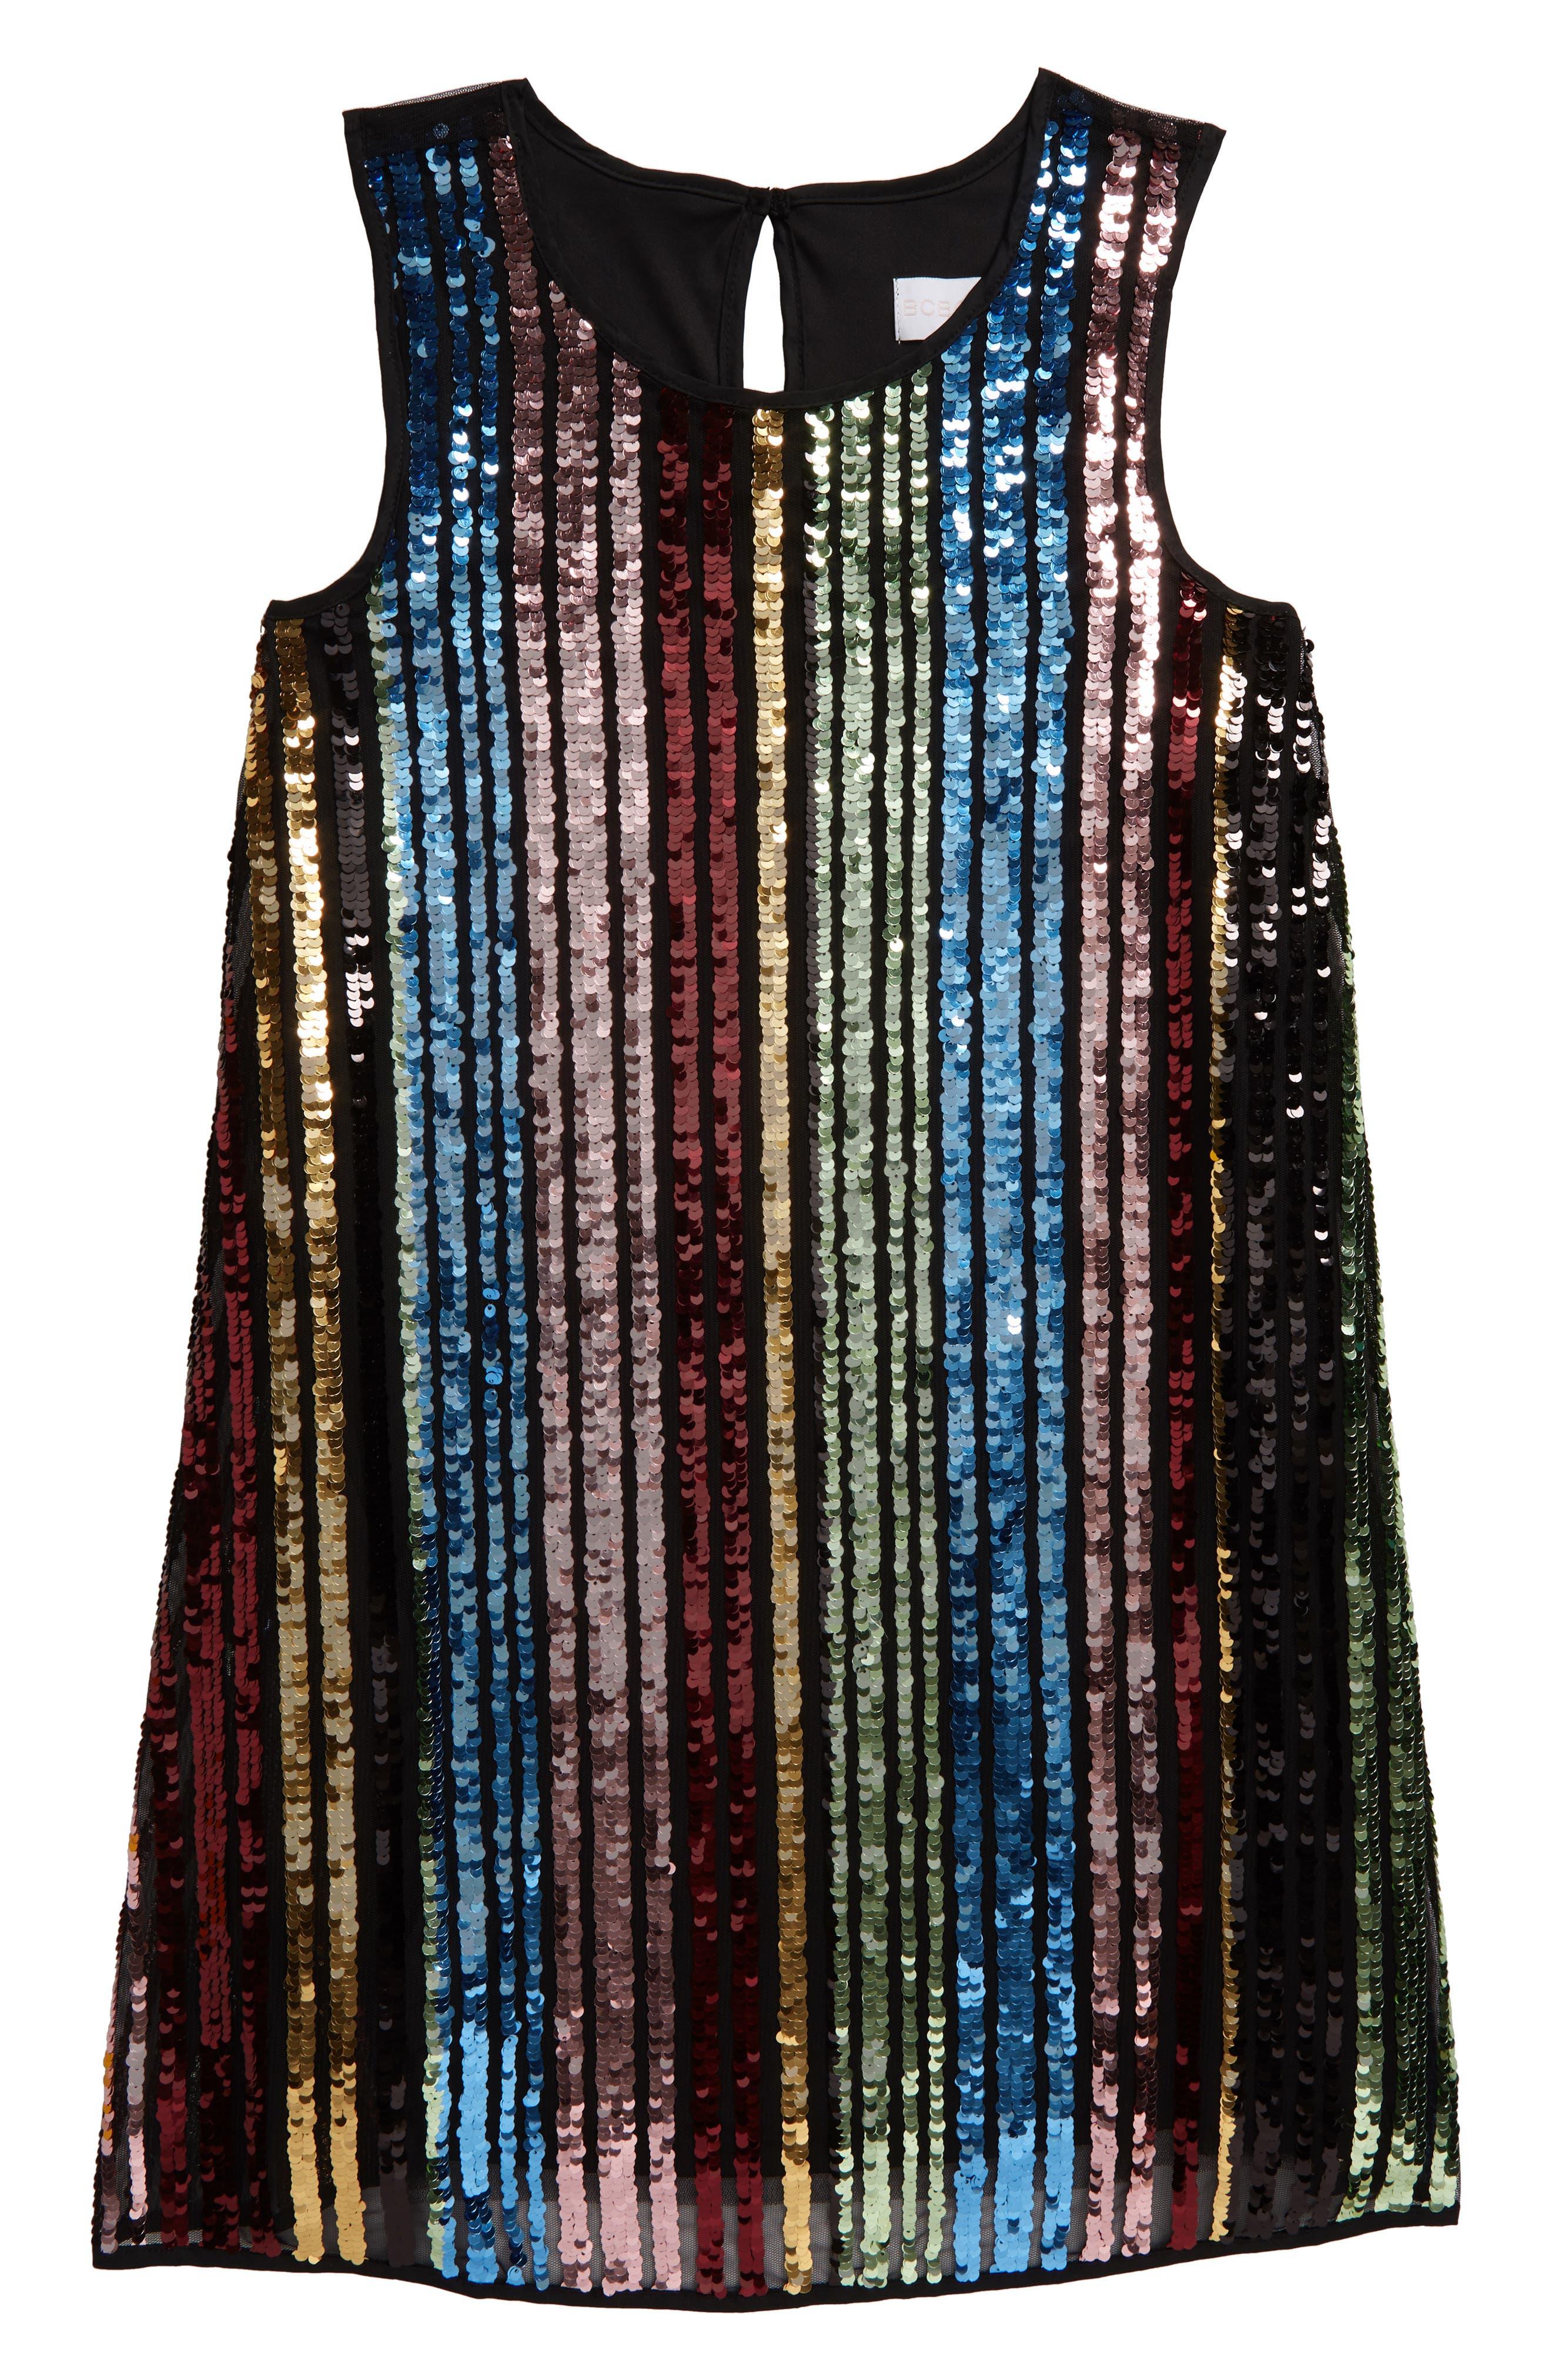 60s 70s Kids Costumes & Clothing Girls & Boys Girls Bcbg Sequin Stripe Dress $58.00 AT vintagedancer.com